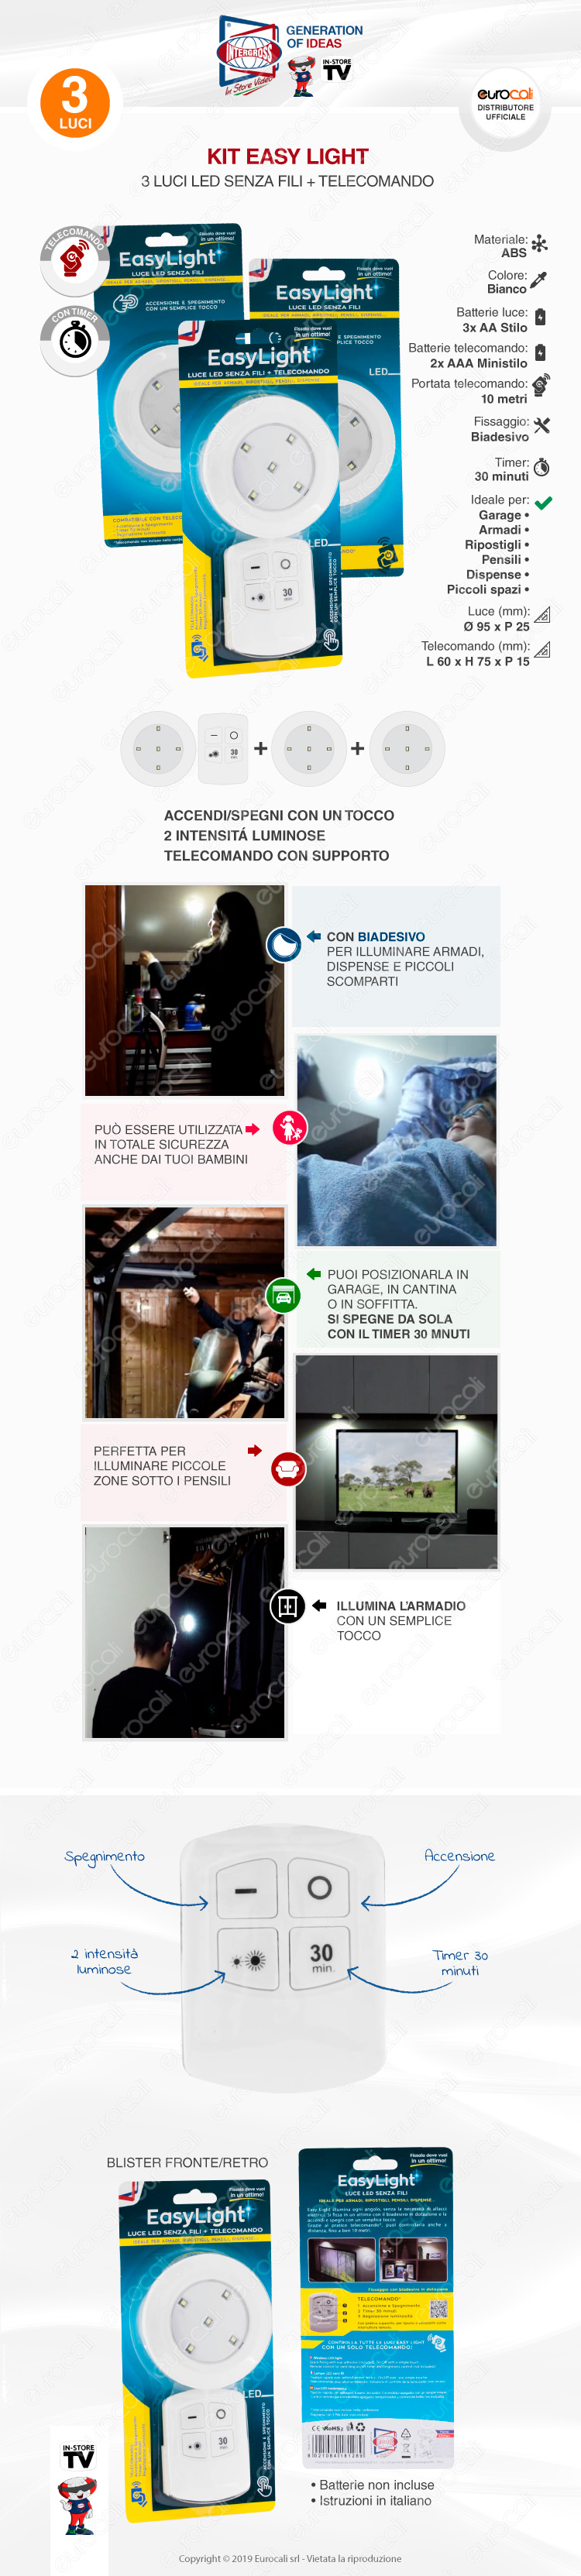 kit 3 intergross Easy Light luce LED senza fili a batteria CON TELECOMANDO